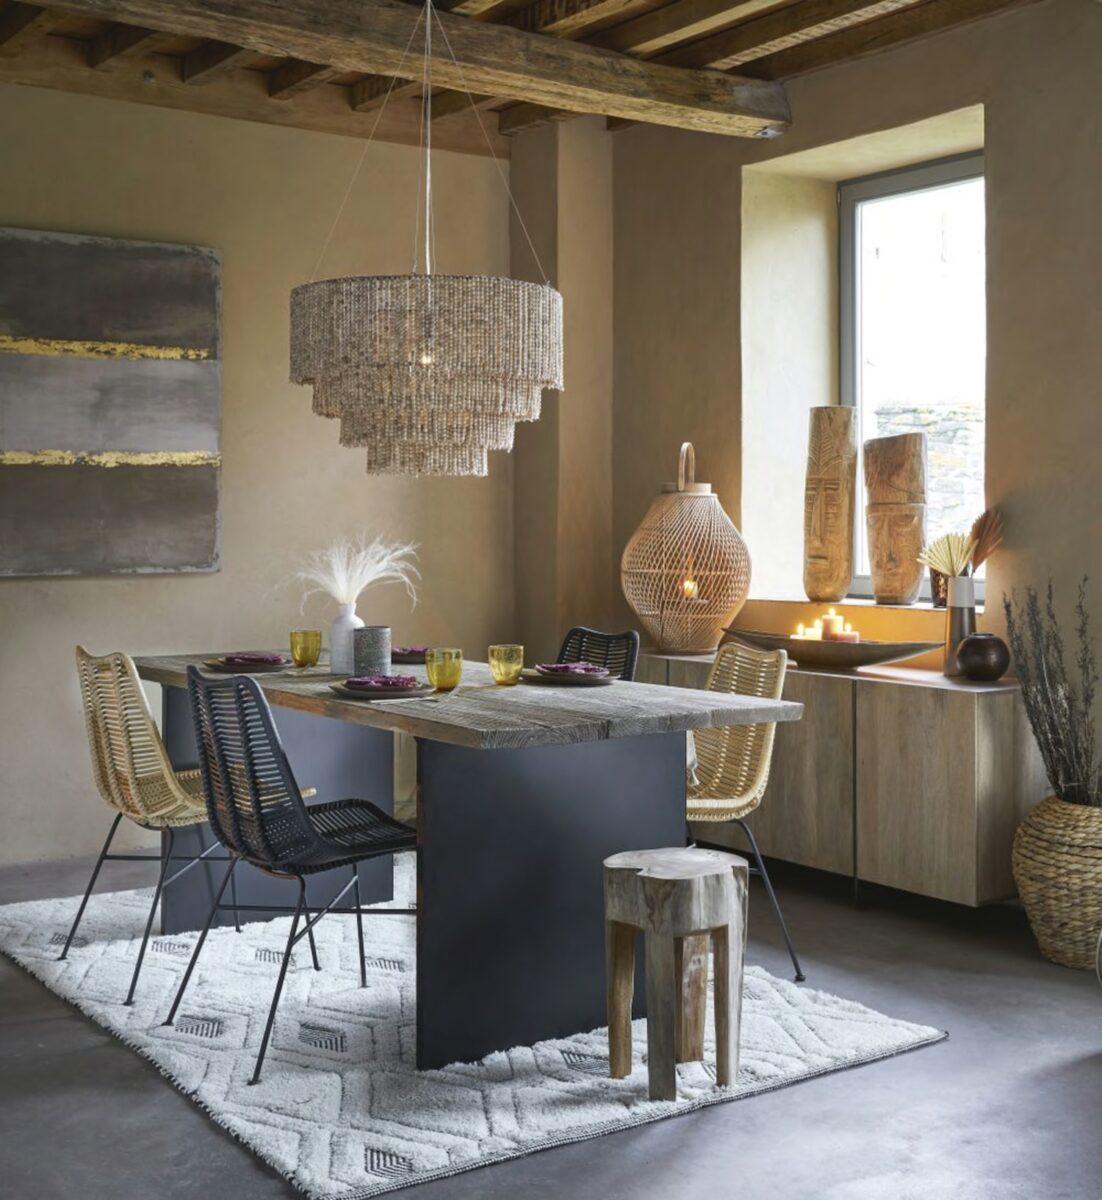 maisons-du-monde-2021-decorazioni-parete-cover-1